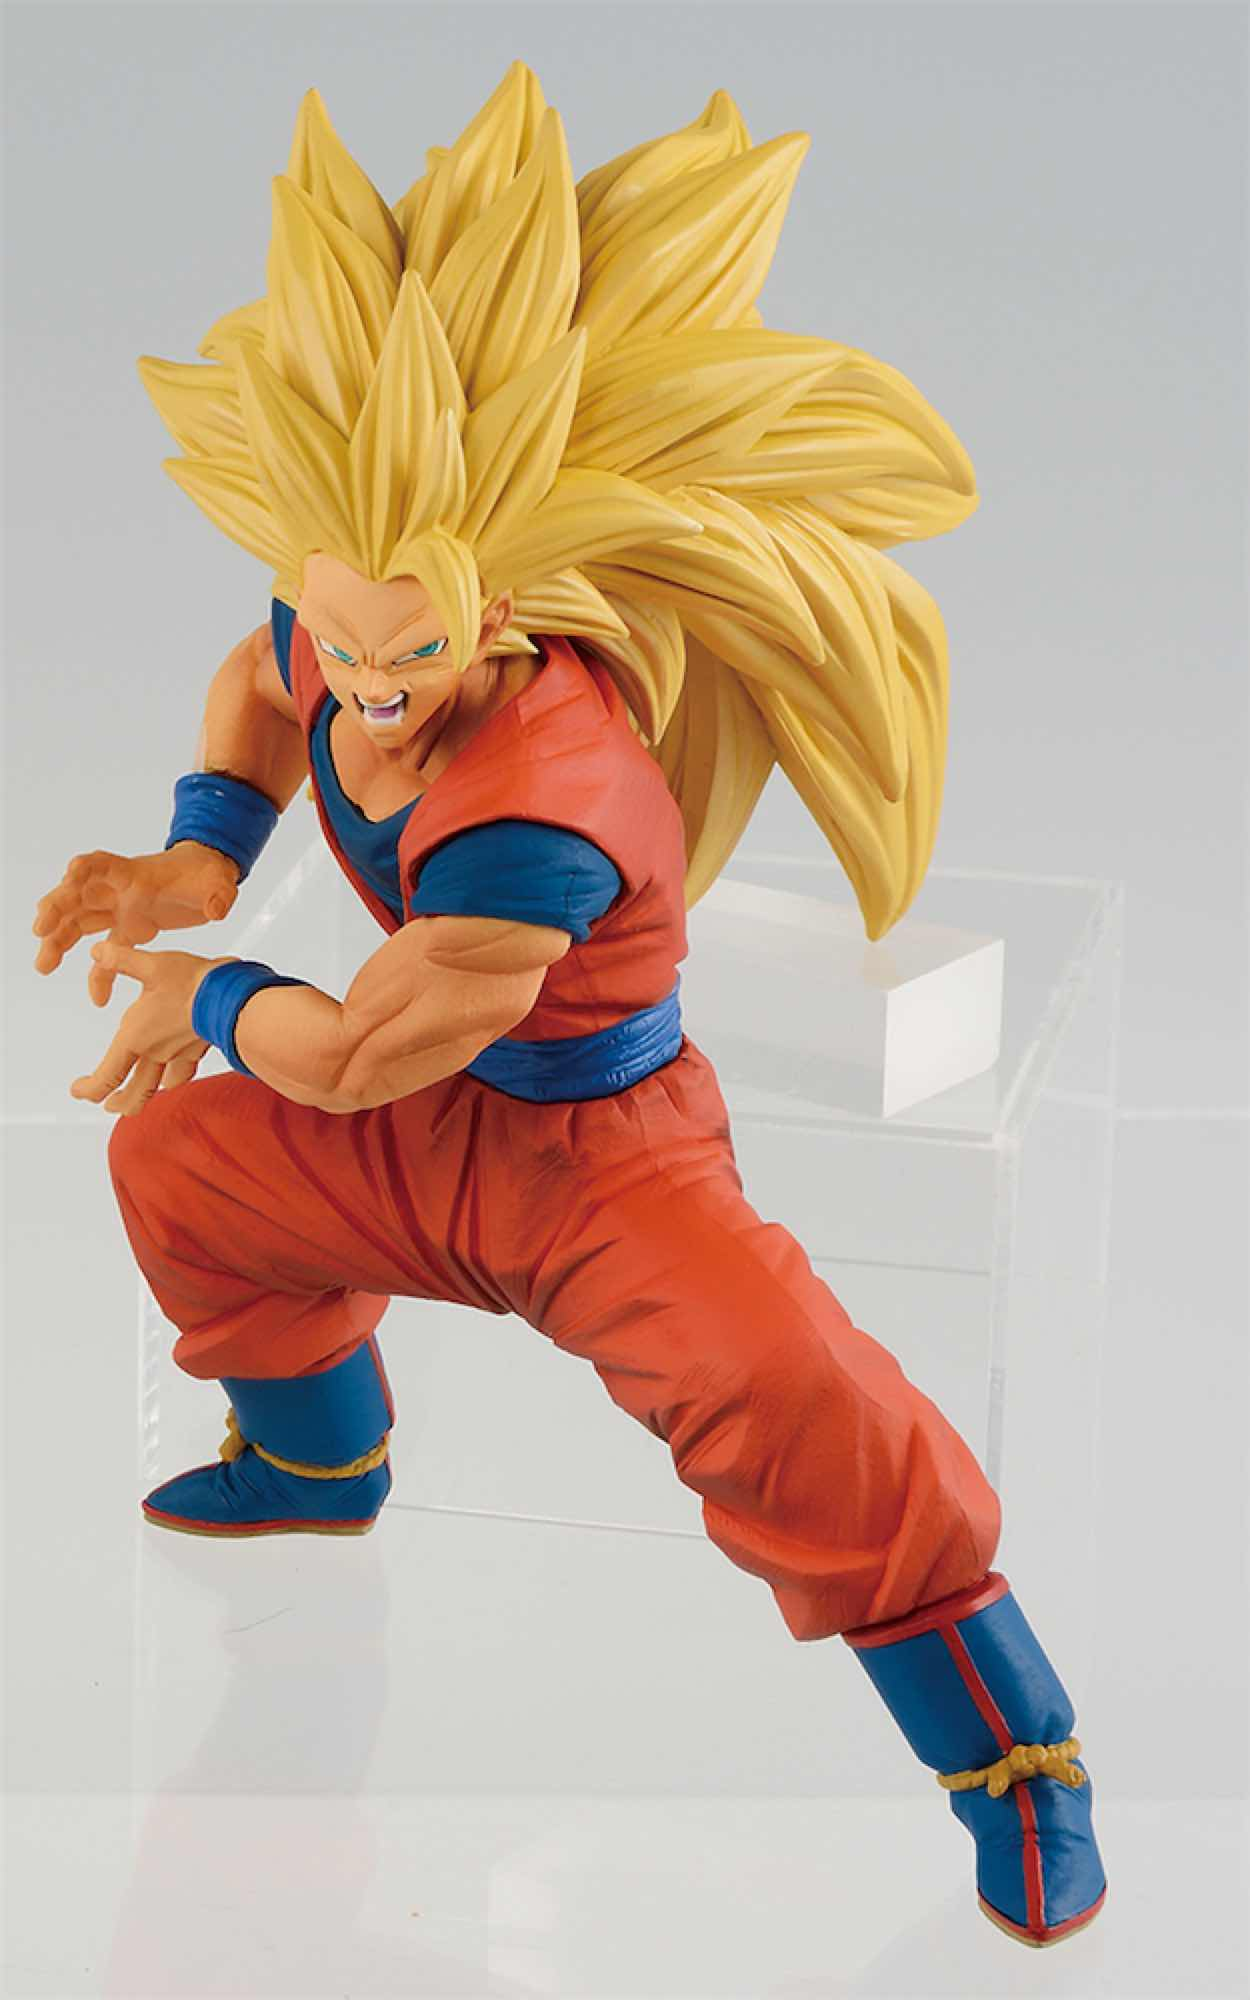 SUPER SAIYAN 3 SON GOKU FIGURA 14 CM DRAGON BALL SUPER SON GOKU FES!!